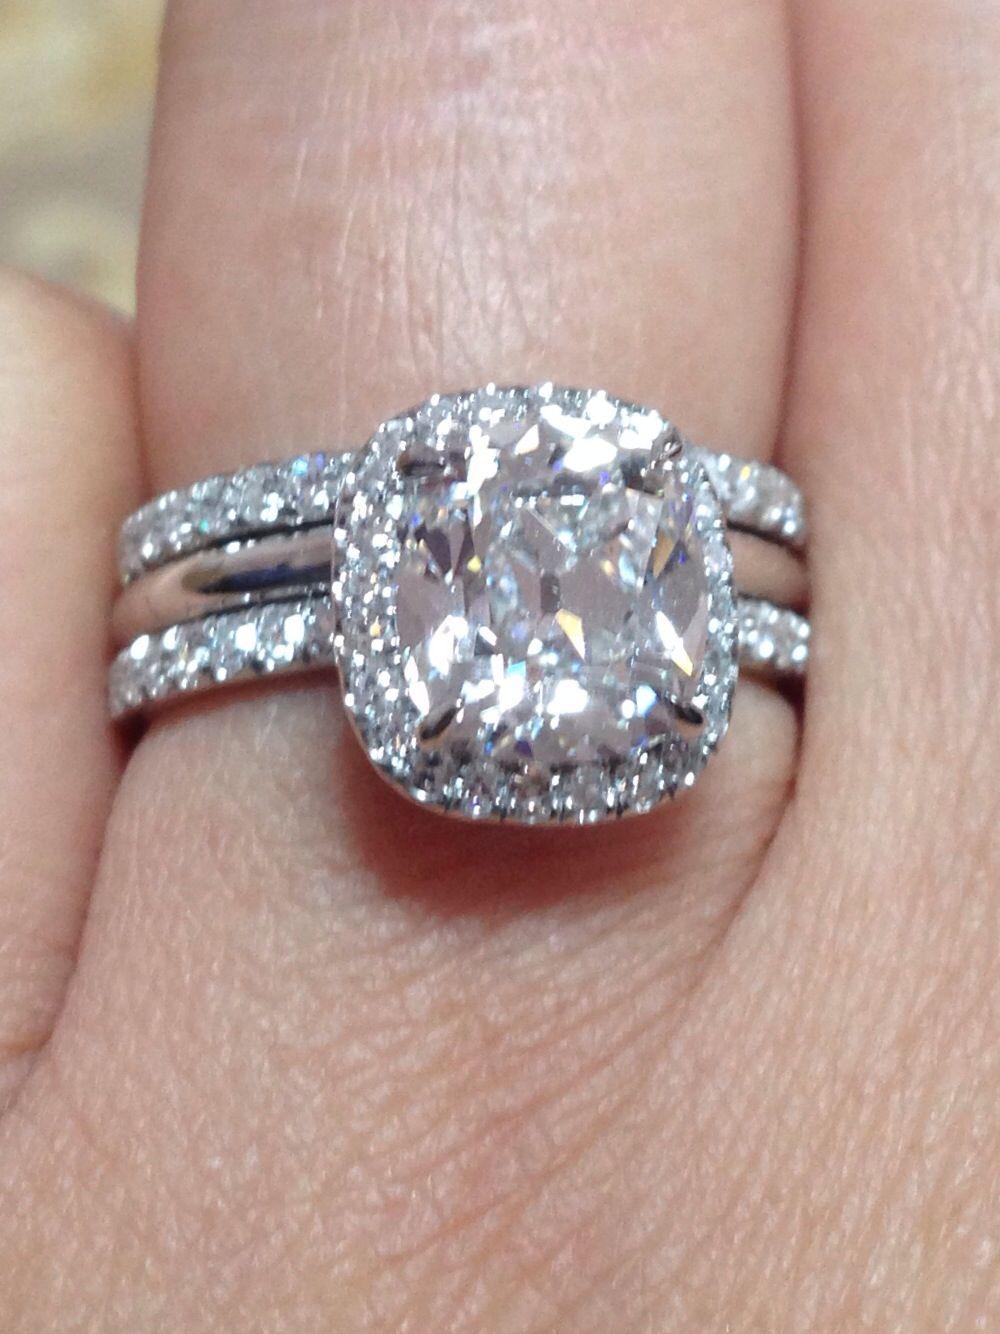 wedding ring spacer wedding ring spacer Wedding ring spacer Victor Canera Custom Platinum Spacer Pave Eternity Wedding Band And Emilya Engagement